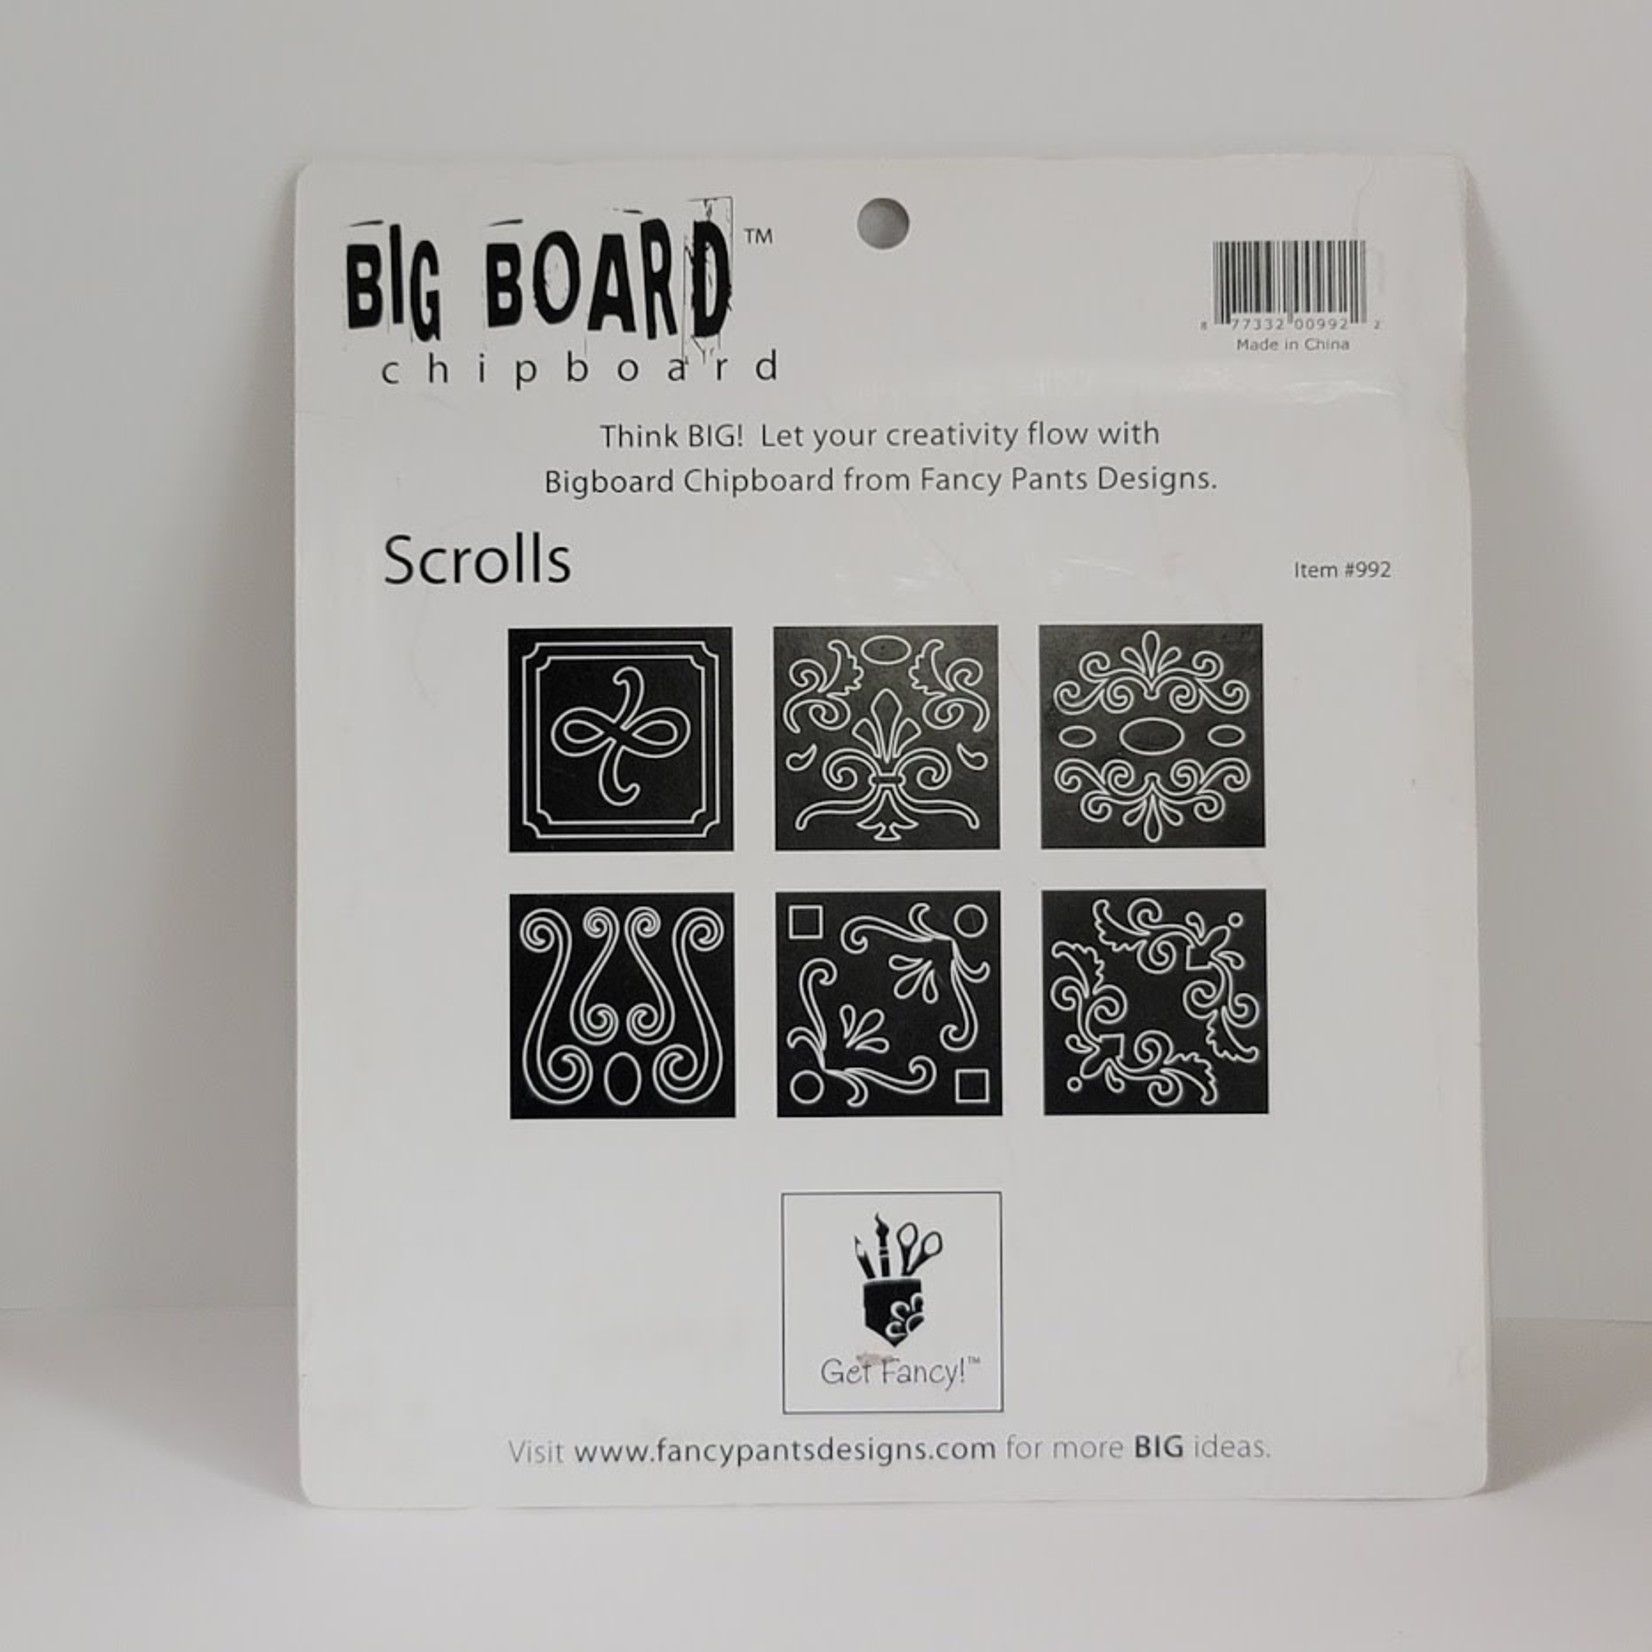 Big Board - Chipboard - Scrolls